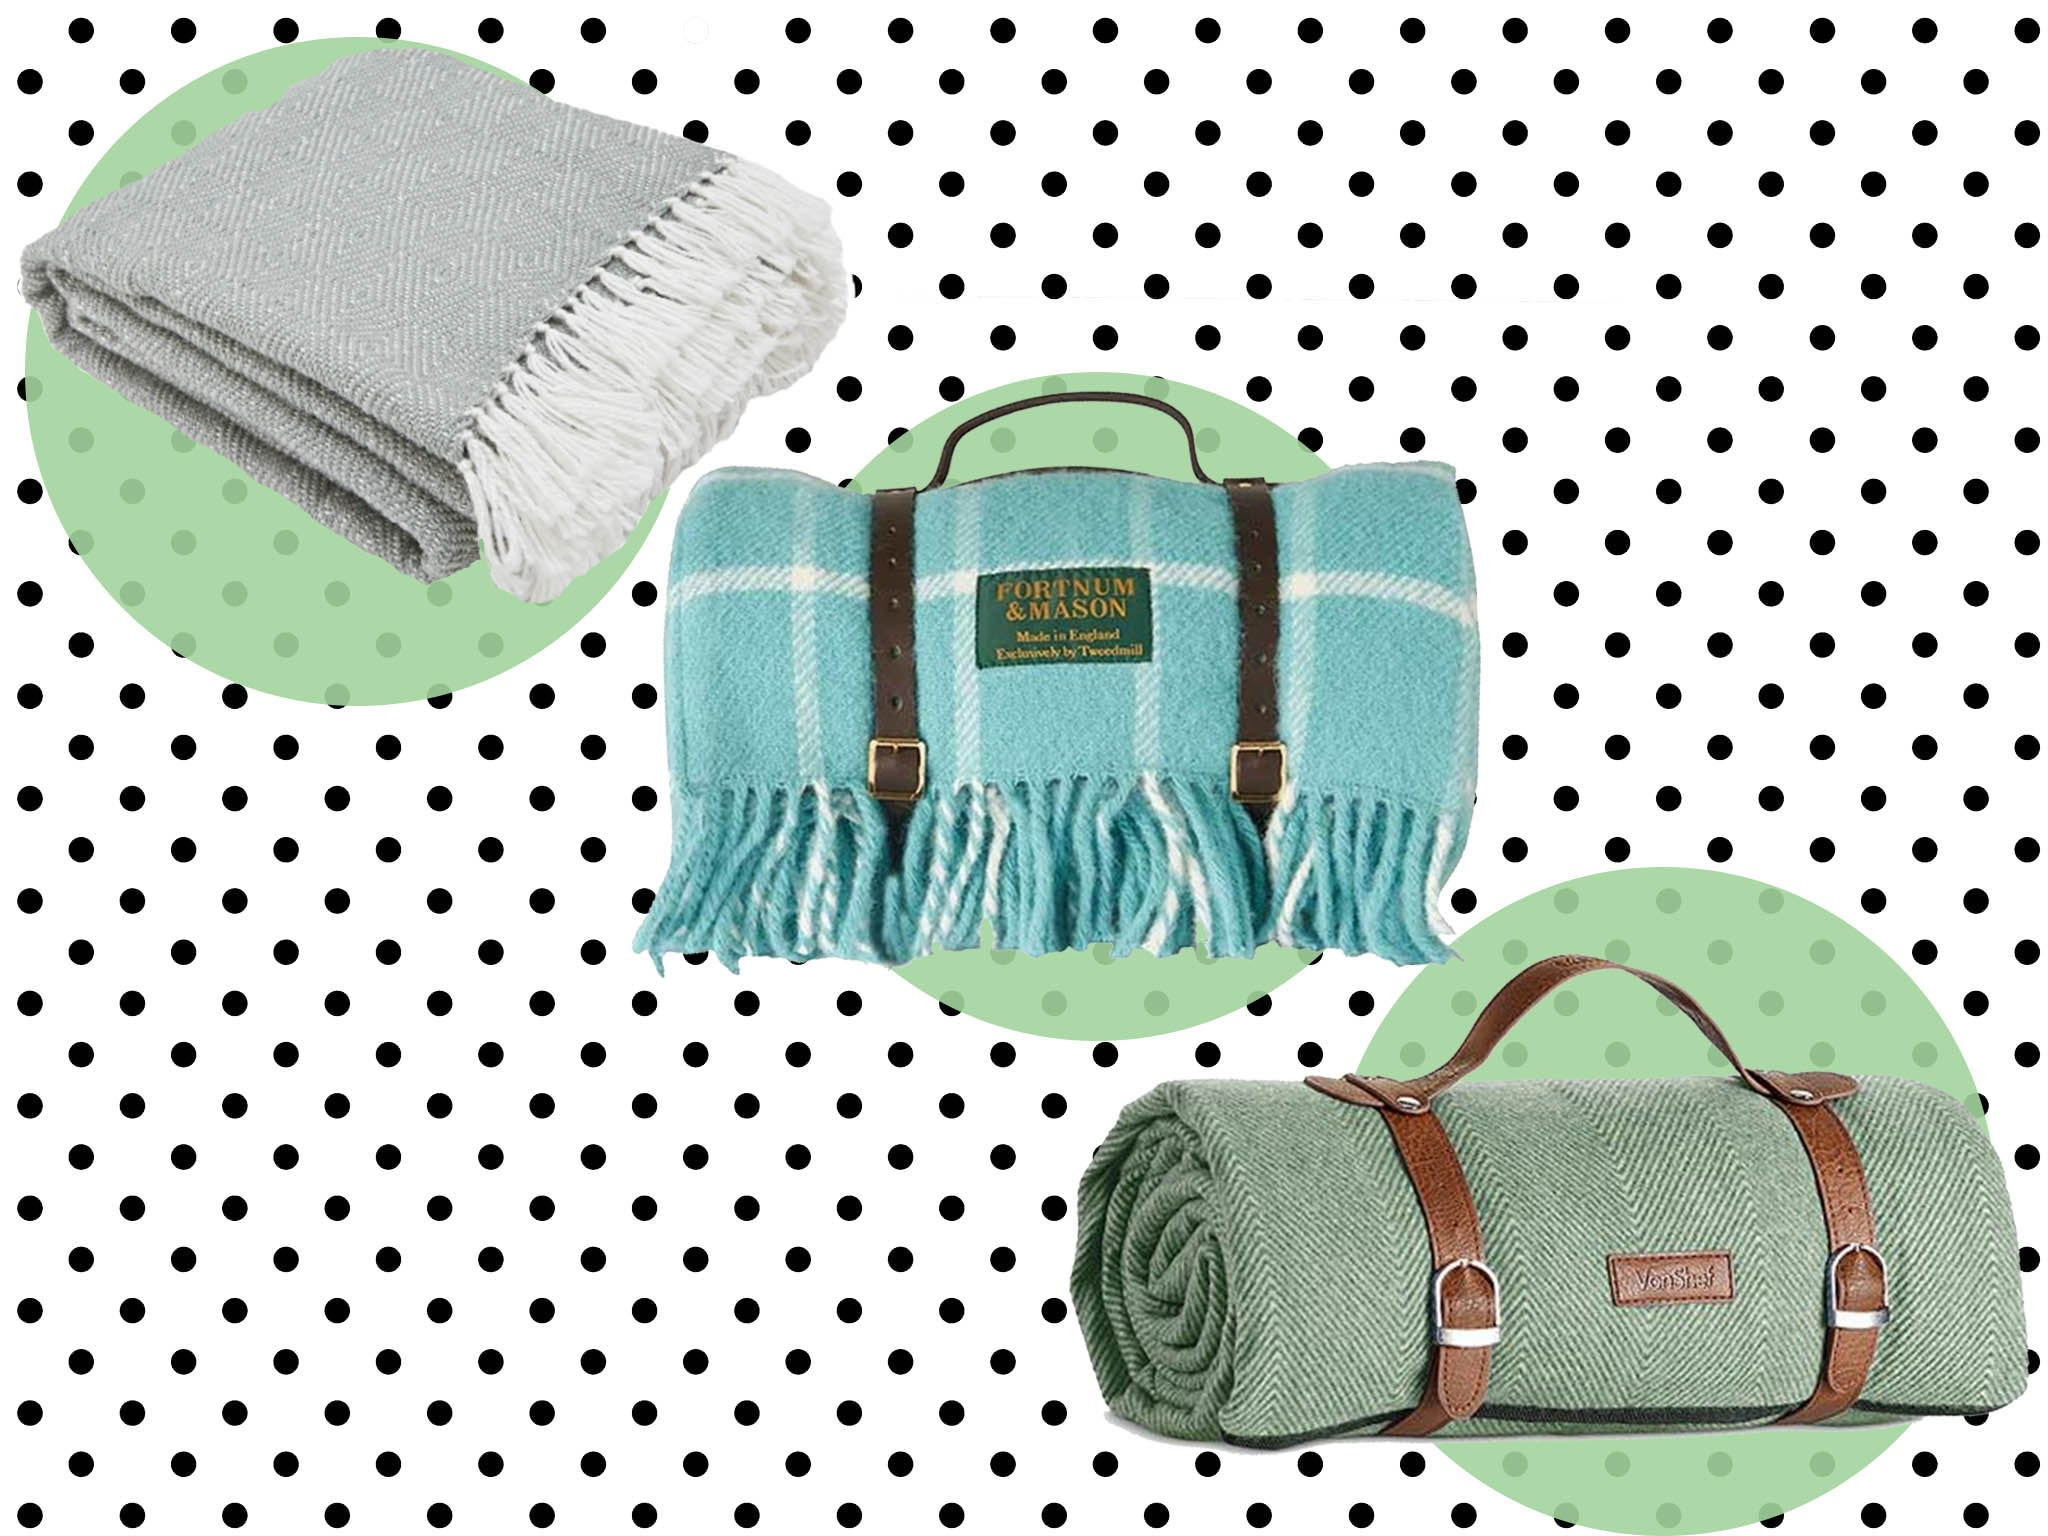 Velosso 100/% Cotton Multi Stripe Weston Towels Super Absorbent Blue, 4 Pce Bale Set